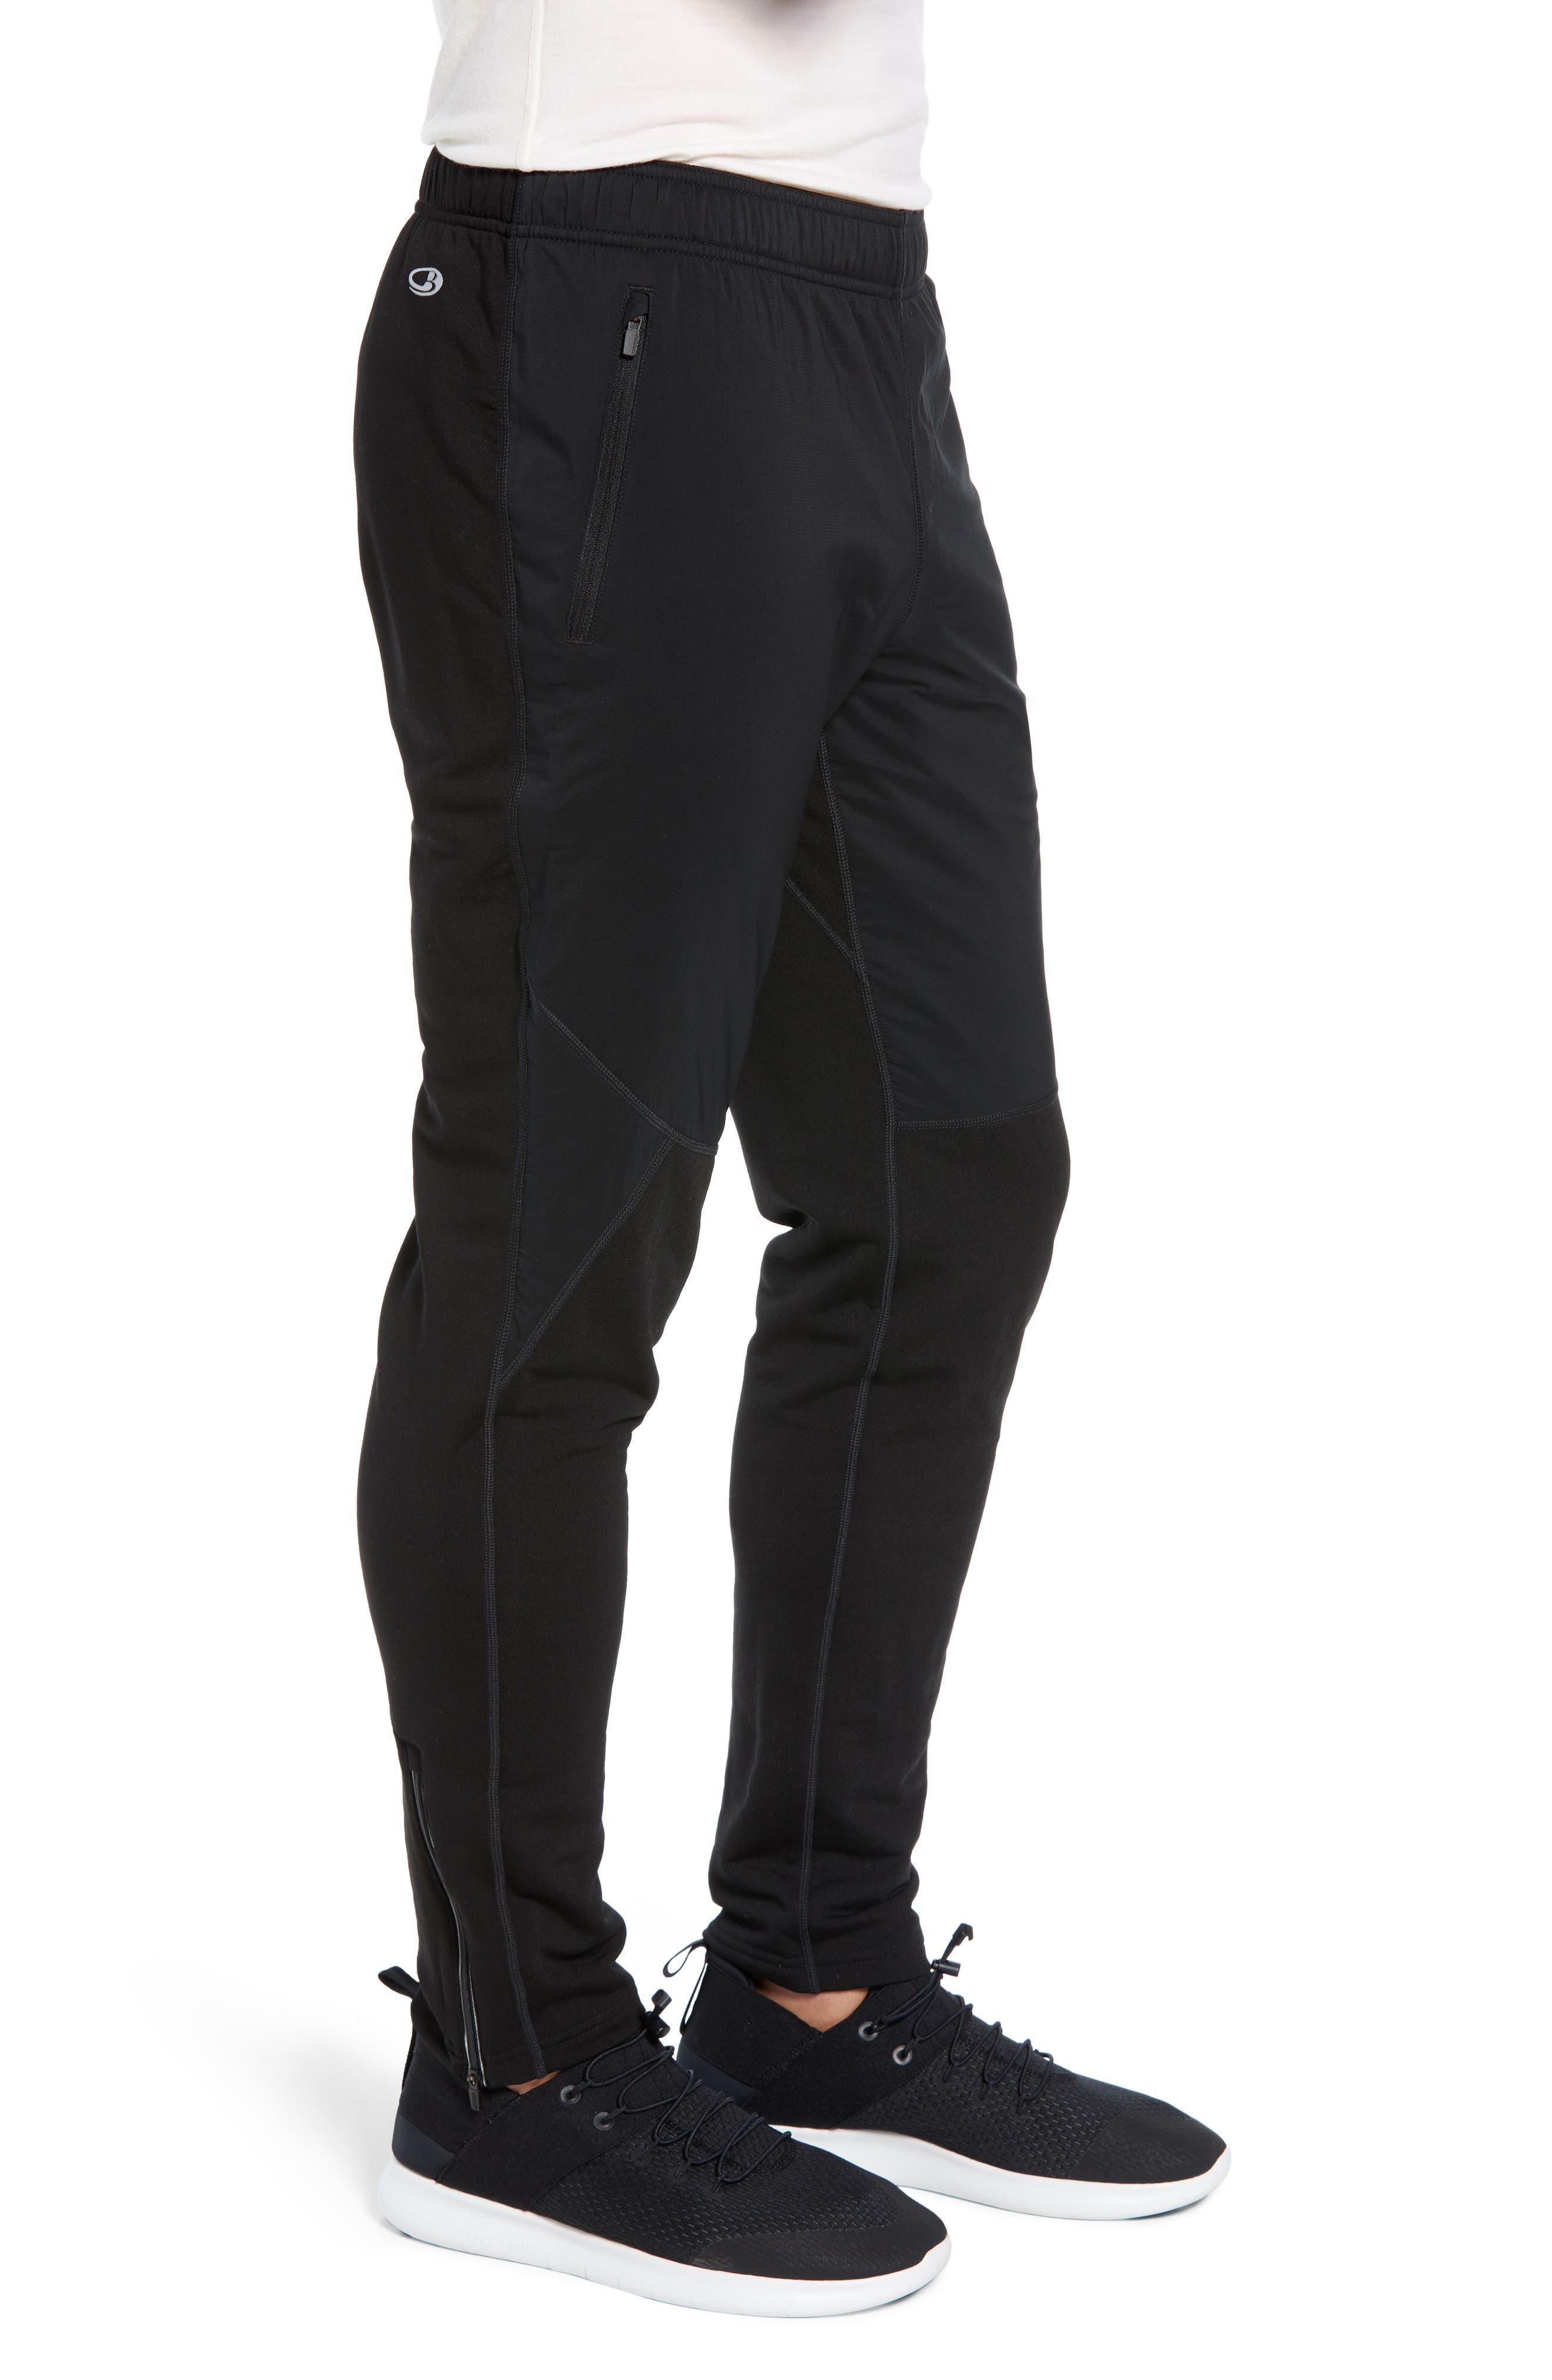 Tech Trainer Hybrid Sport Pants,                             Alternate thumbnail 3, color,                             BLACK